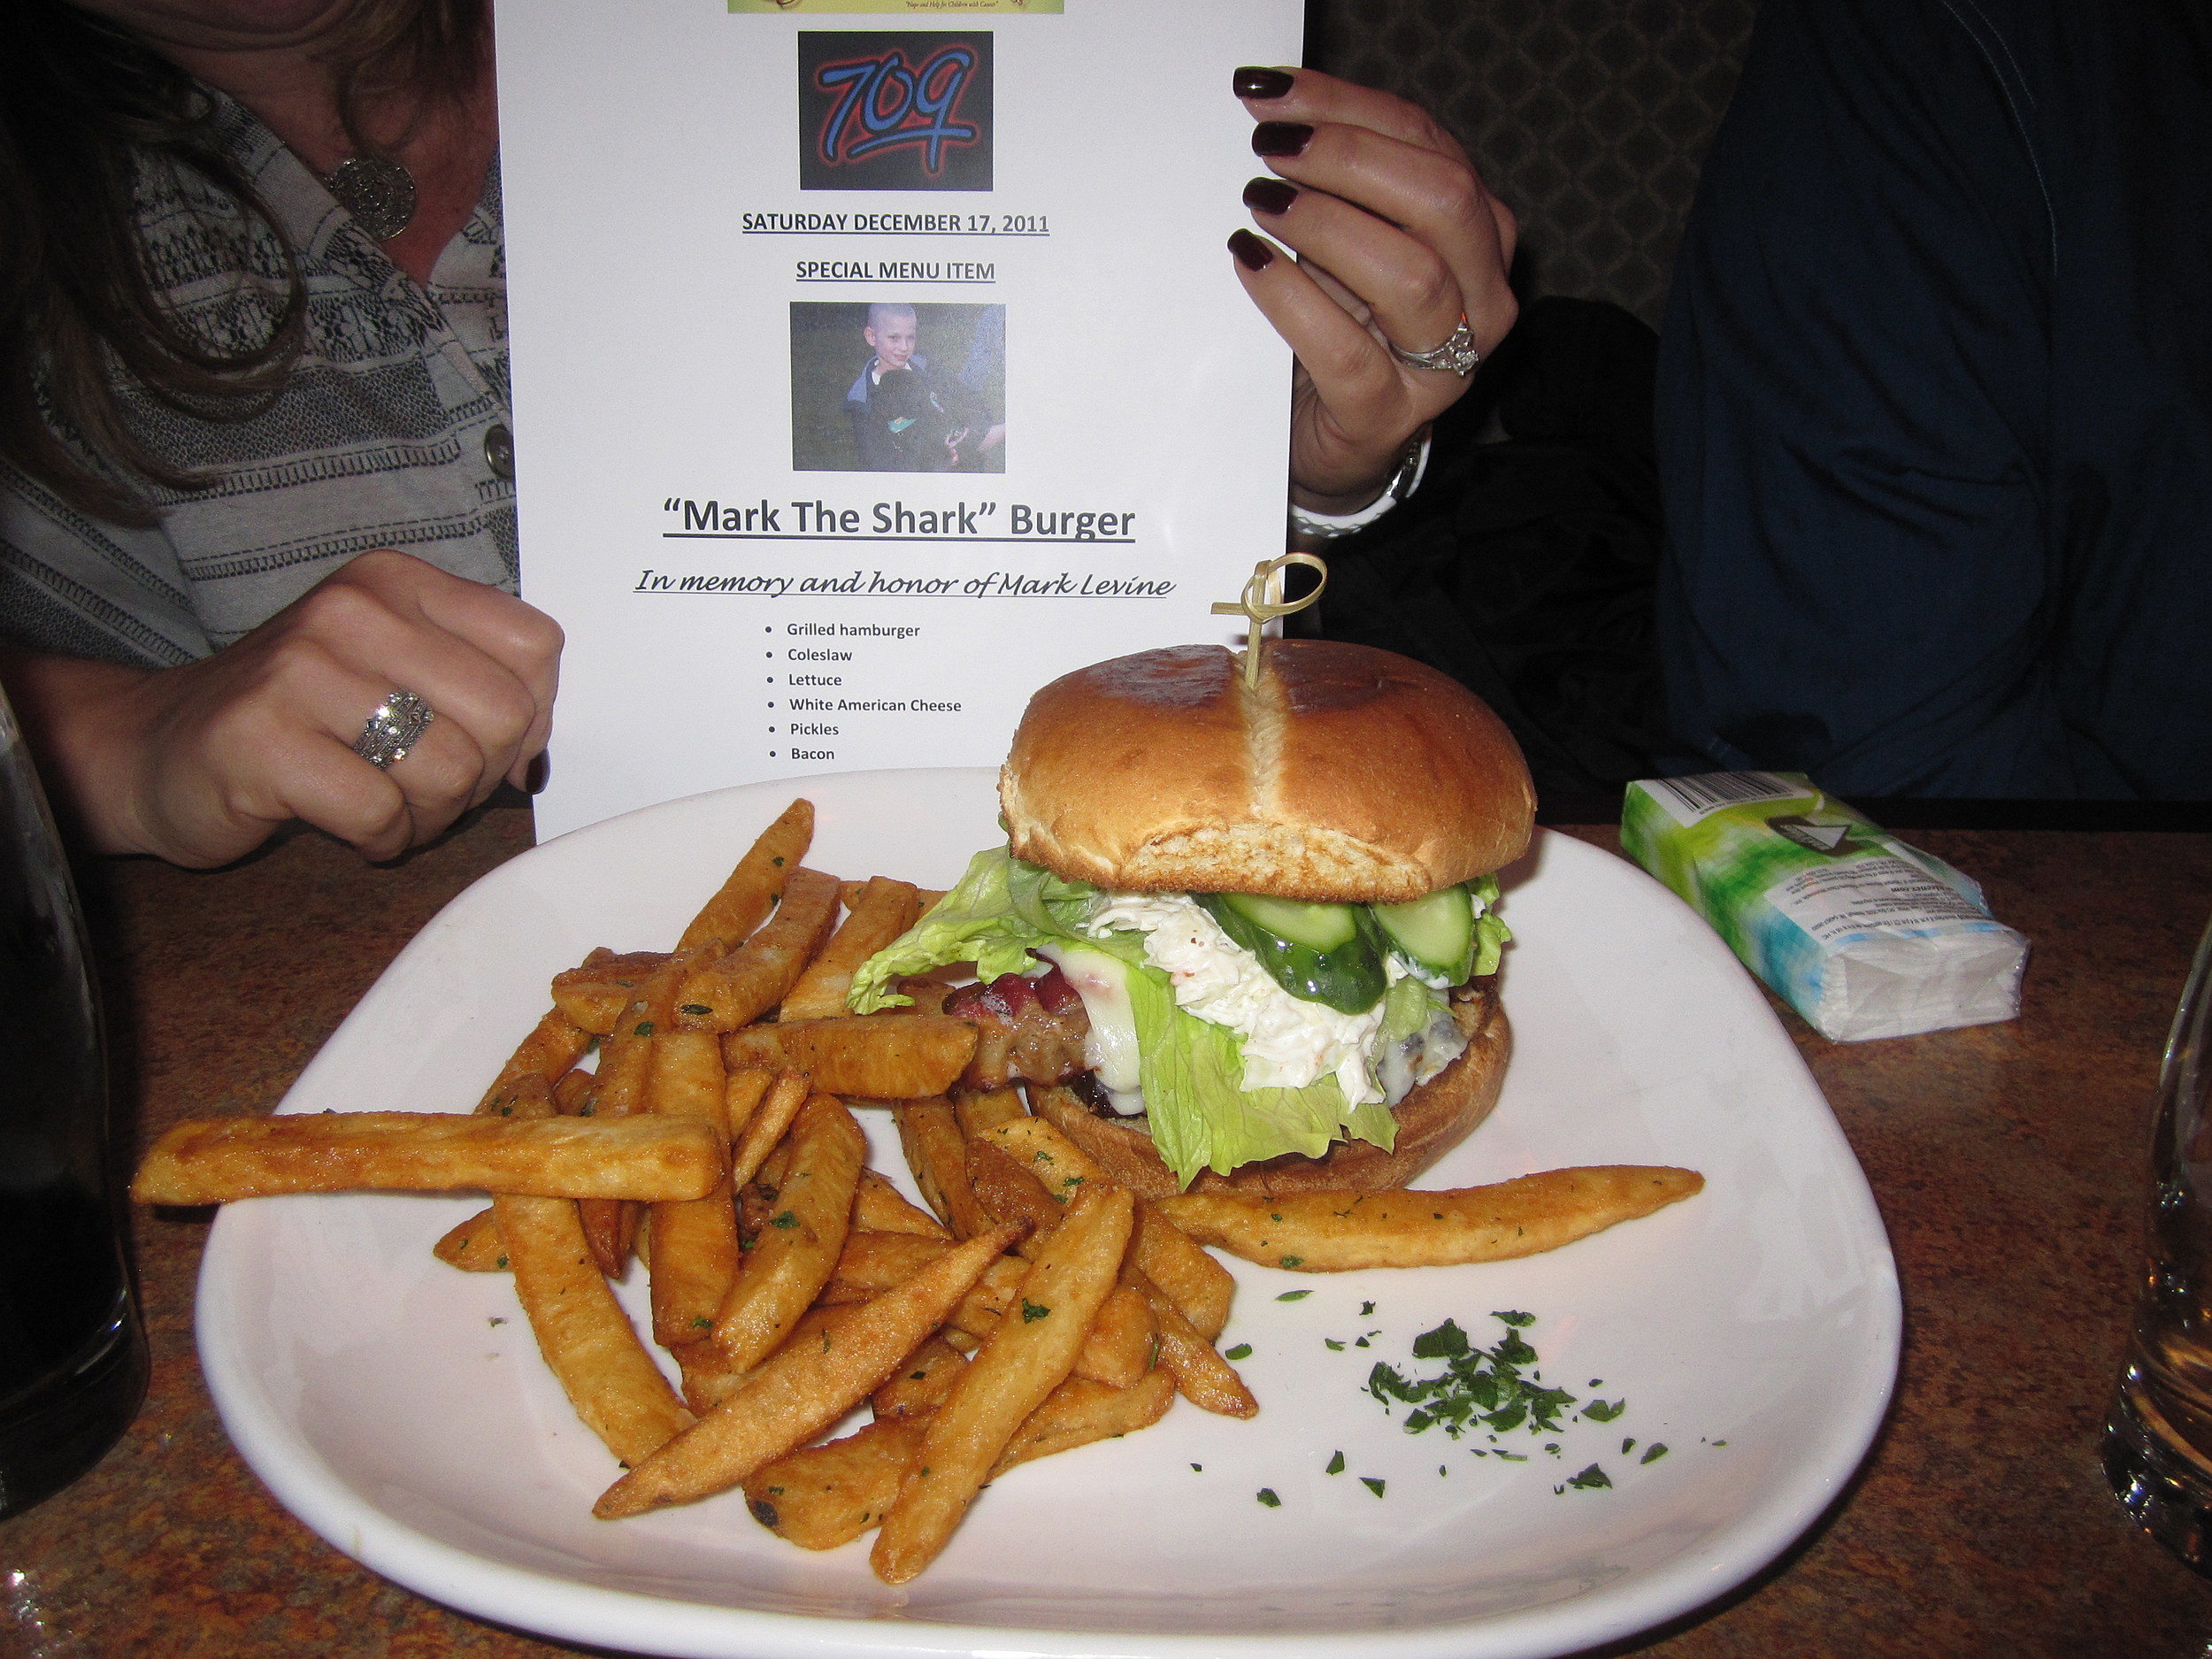 Mark The Shark Burger